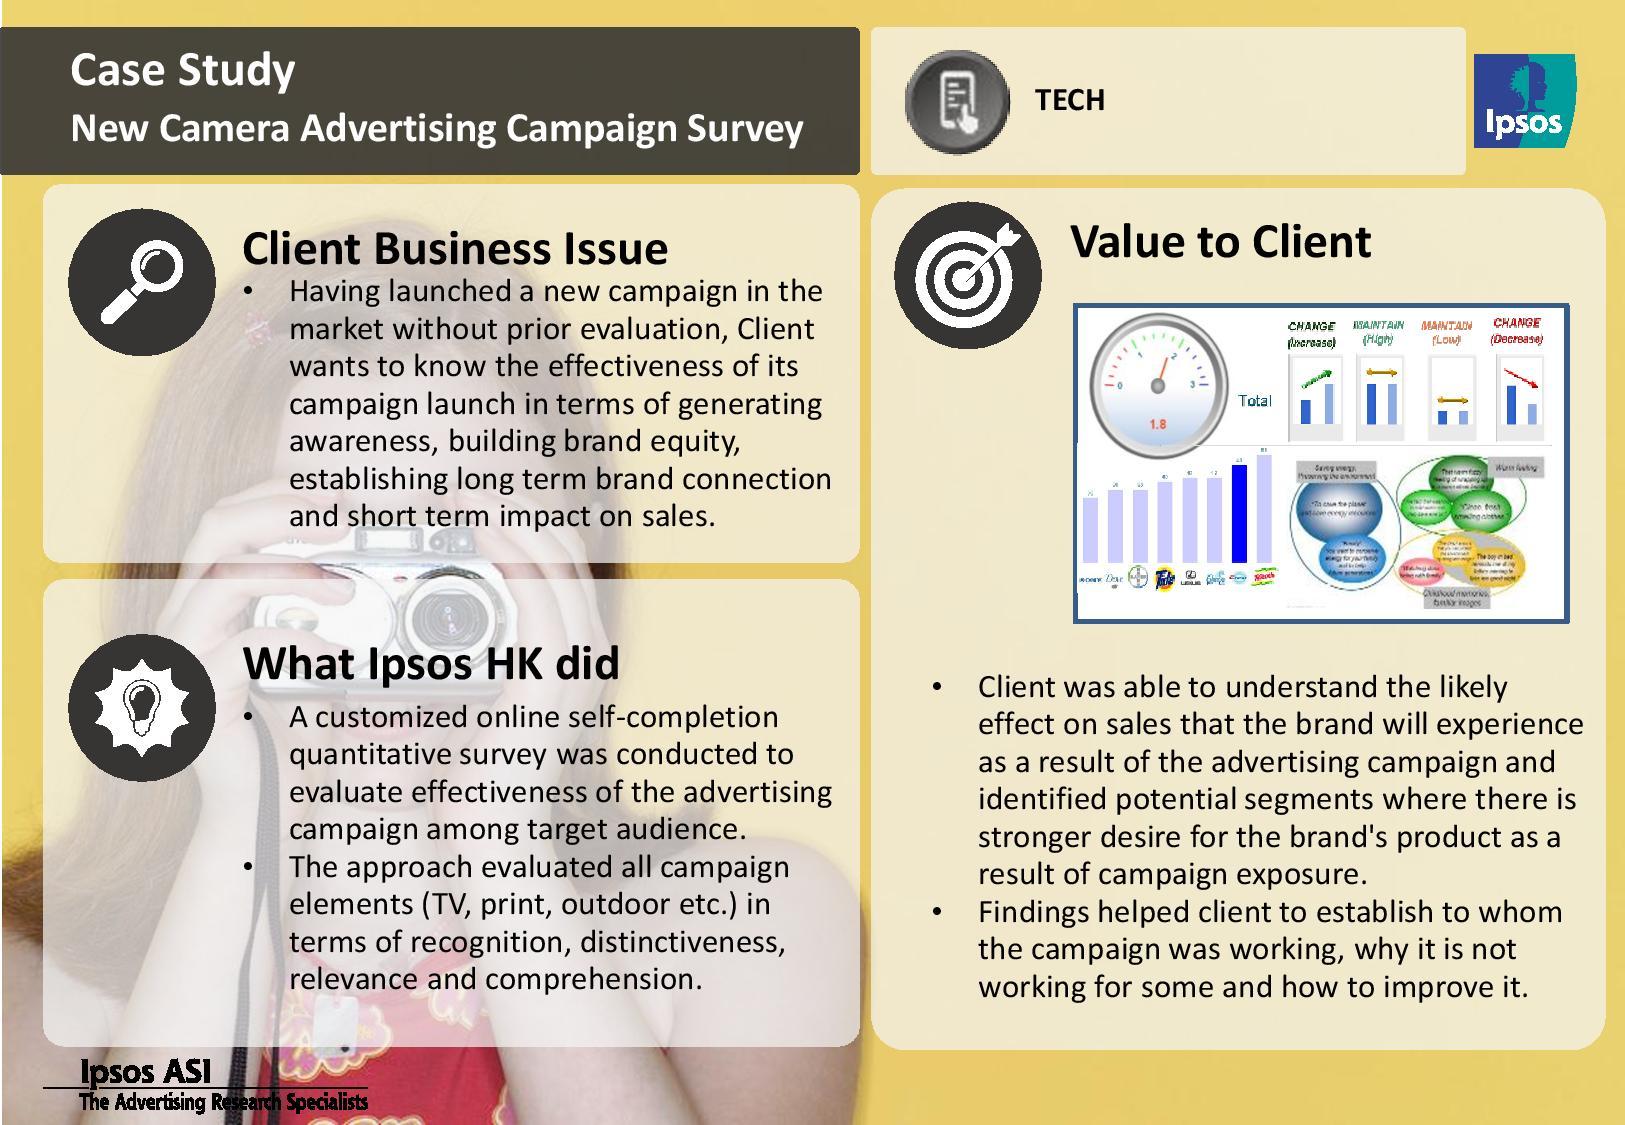 Case Study - New Camera Advertising Campaign Survey | Ipsos